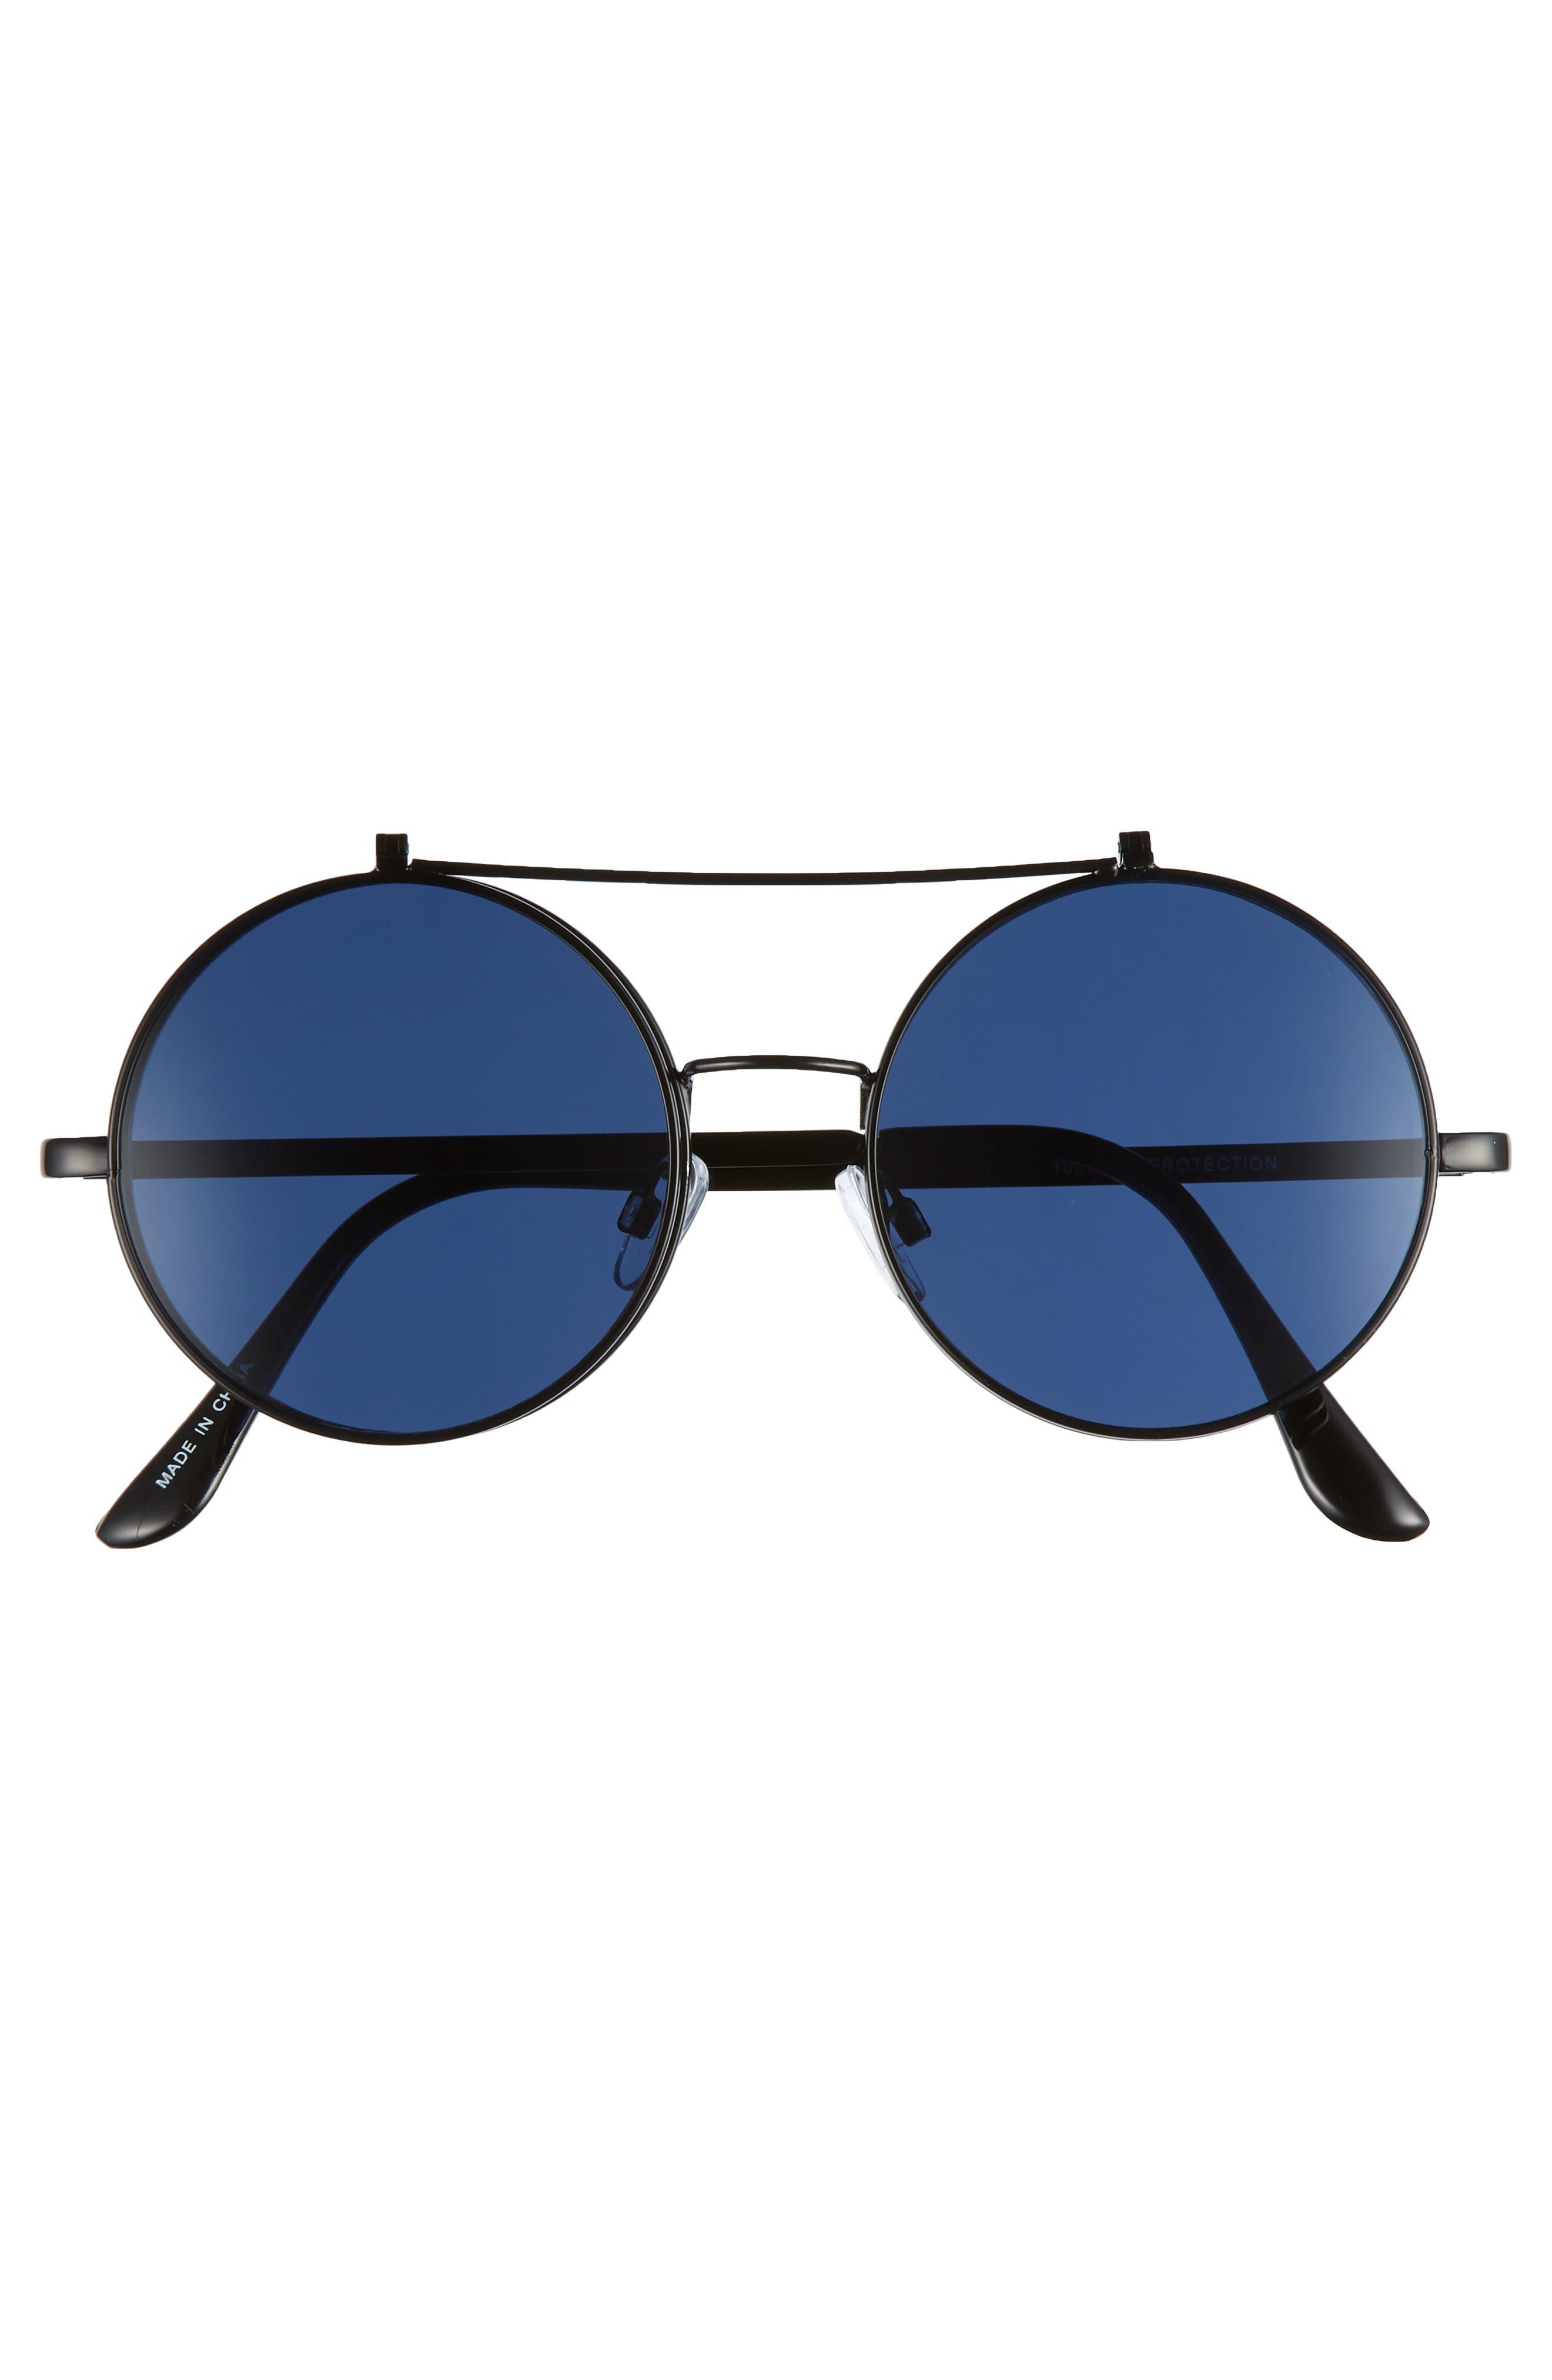 50mm Round Flip-Up Sunglasses,                             Alternate thumbnail 3, color,                             BLACK/ BLUE